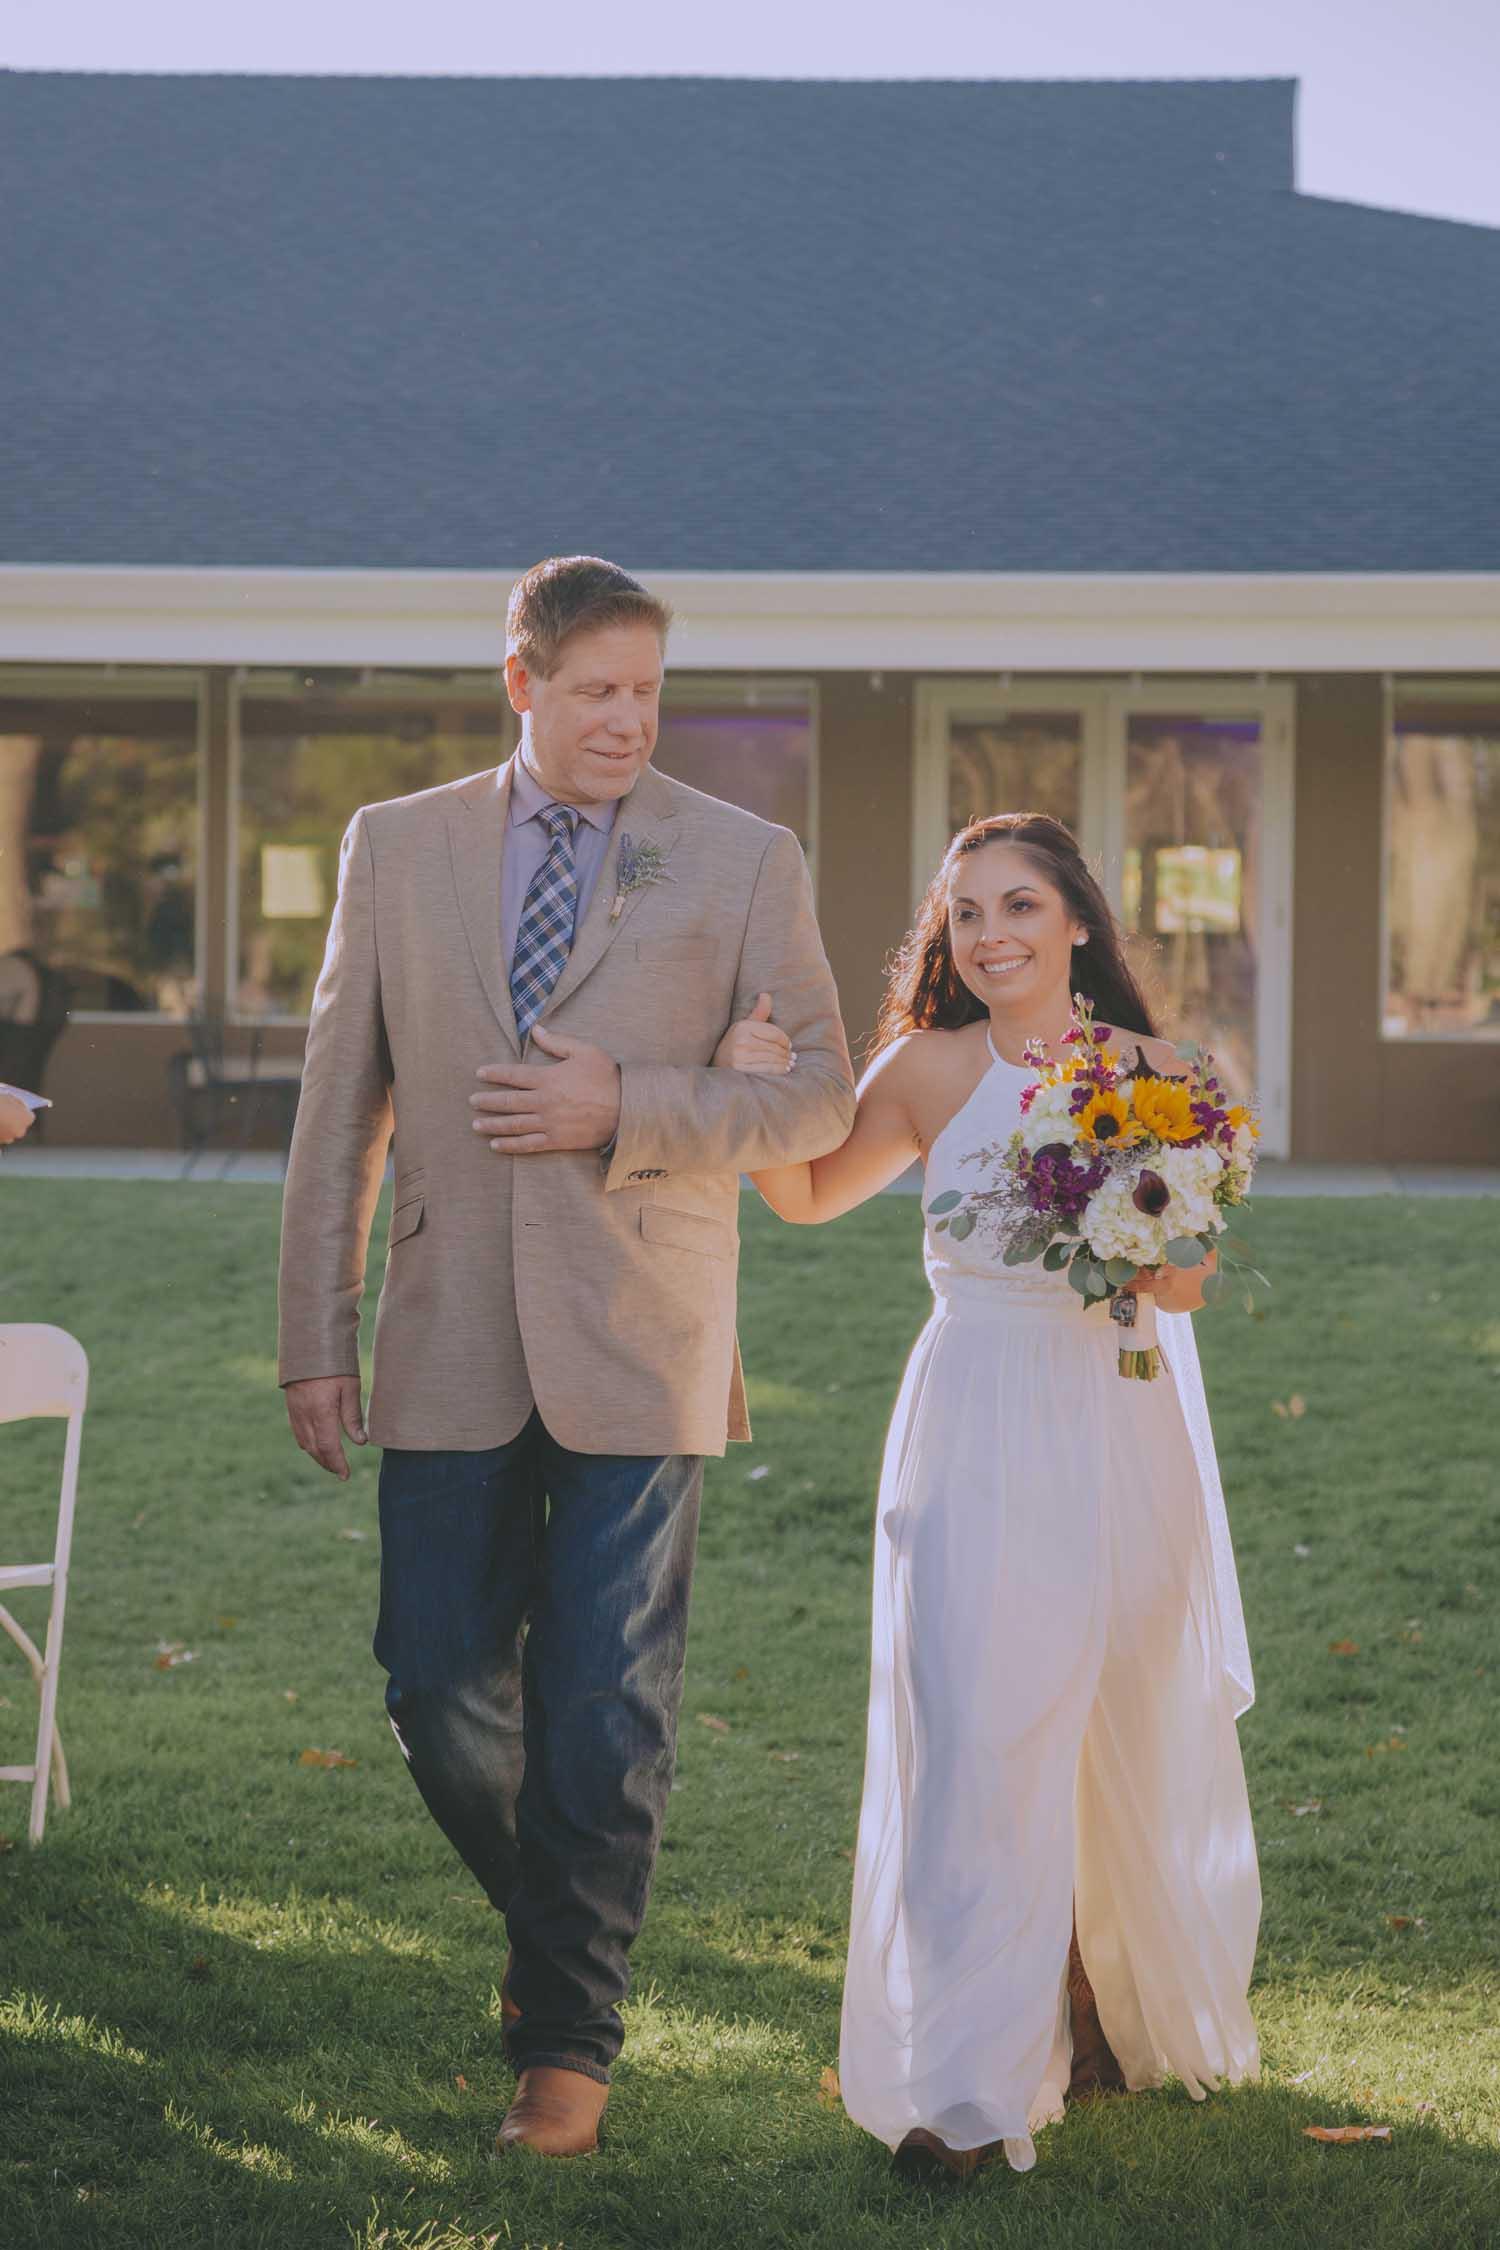 Bonnie-Scott-Rustic-Wedding-Chico-Ca-Butte-Creek-Country-Club185.jpg